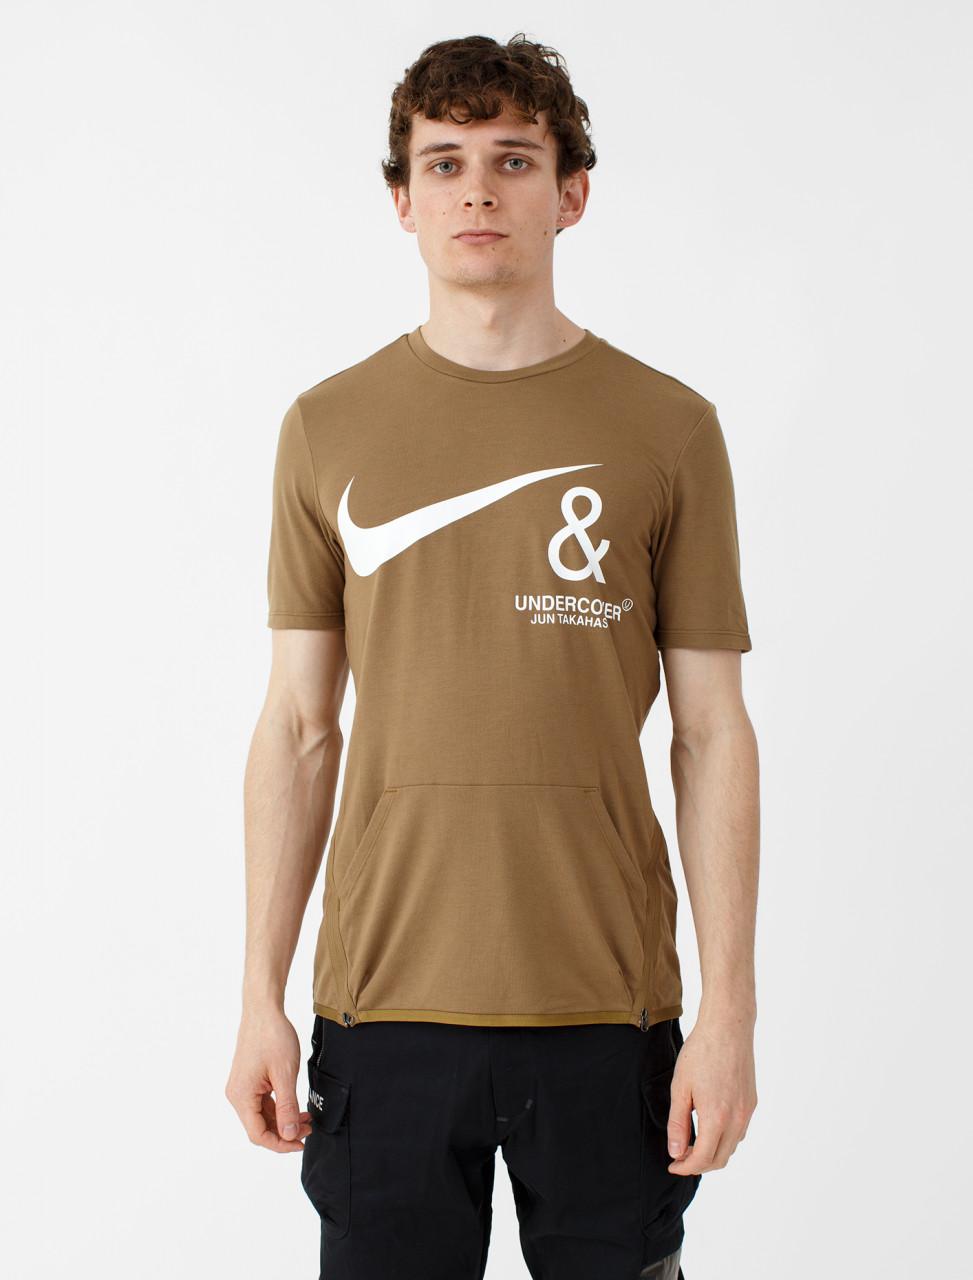 x Undercover Short Sleeve Pocket T-Shirt